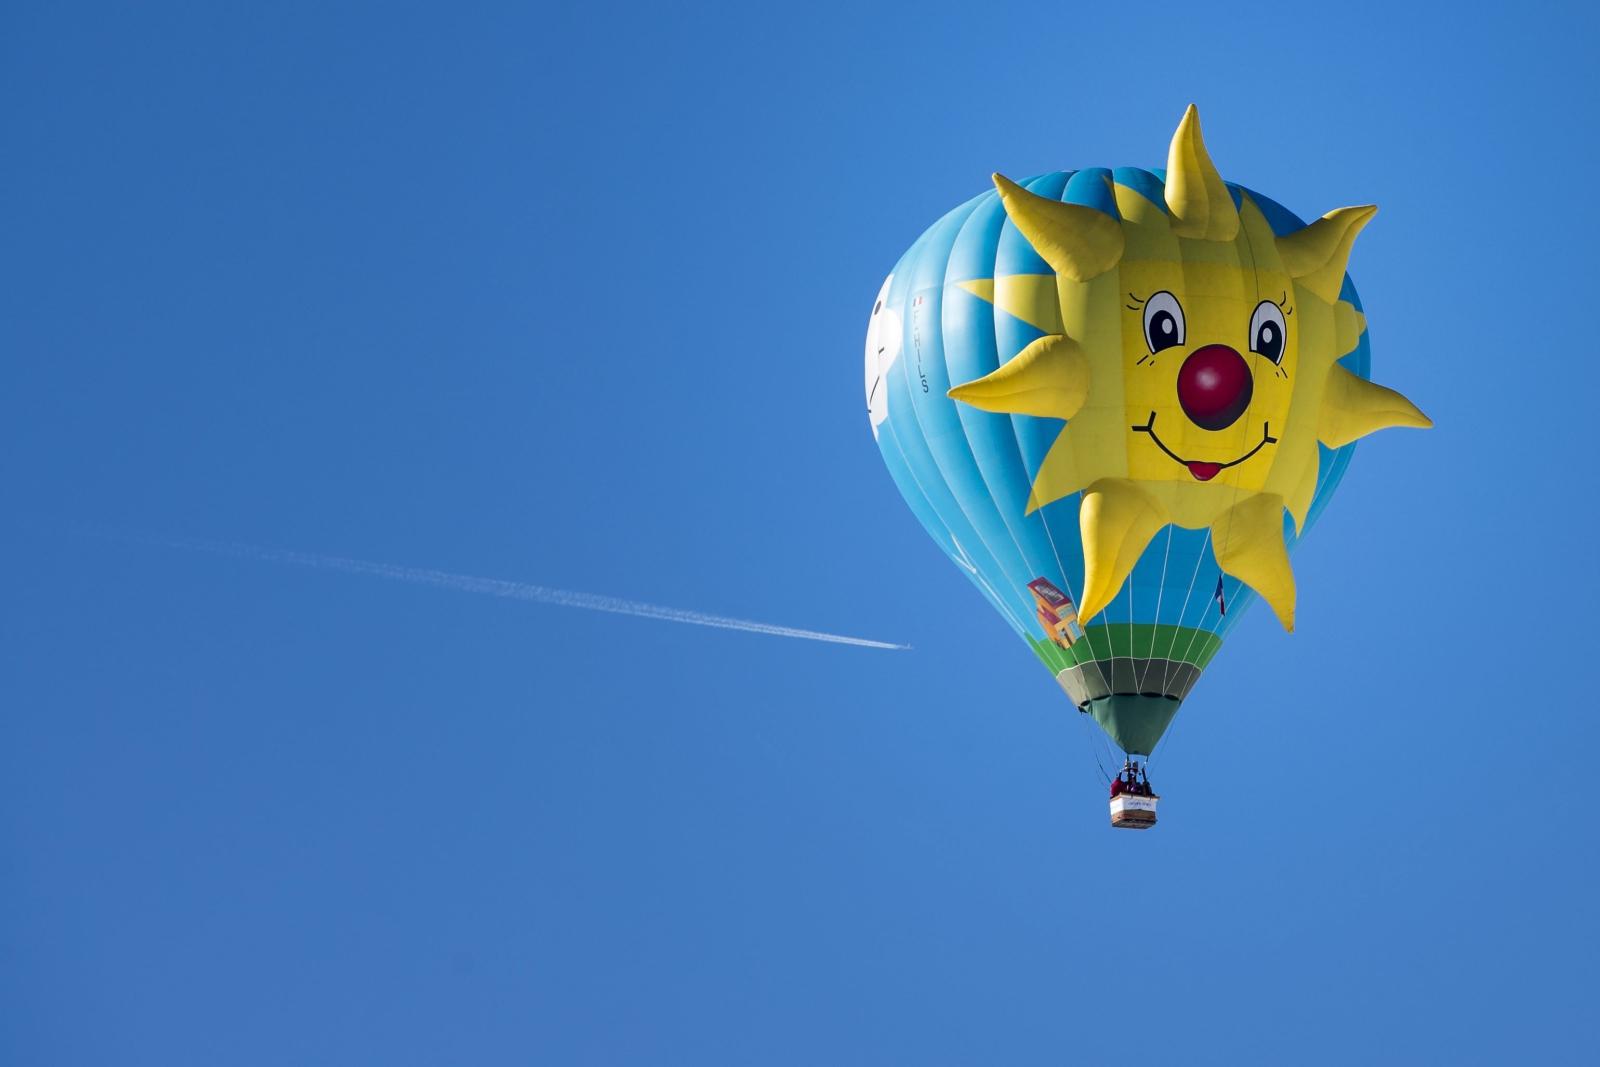 39. Festiwal Balonów w Chateau-d'Oex w Szwajcarii. Fot. PAP/EPA/JEAN-CHRISTOPHE BOTT